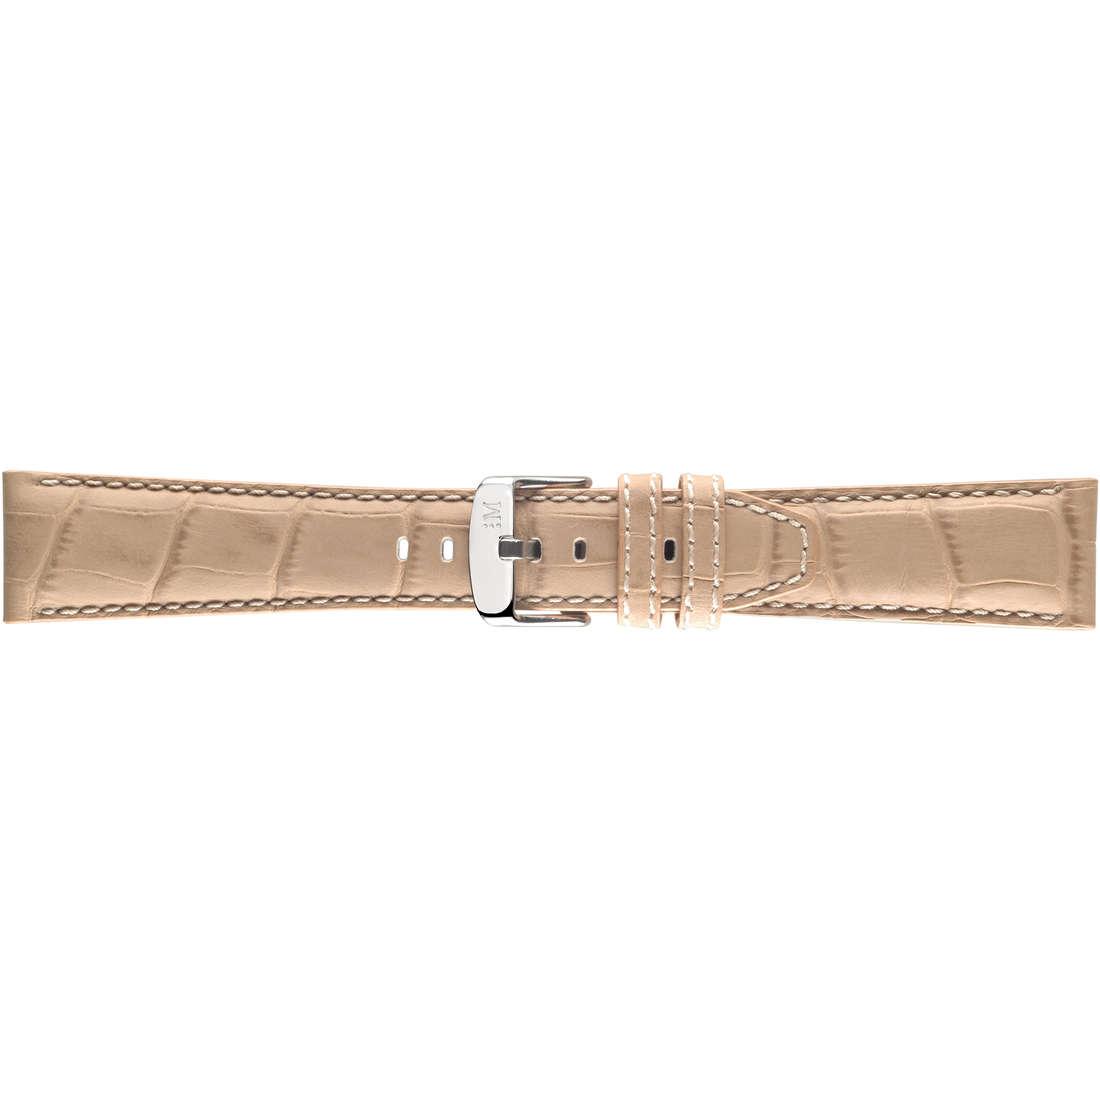 montre bande de montres homme Morellato Linea Sport A01X4497B44027CR22